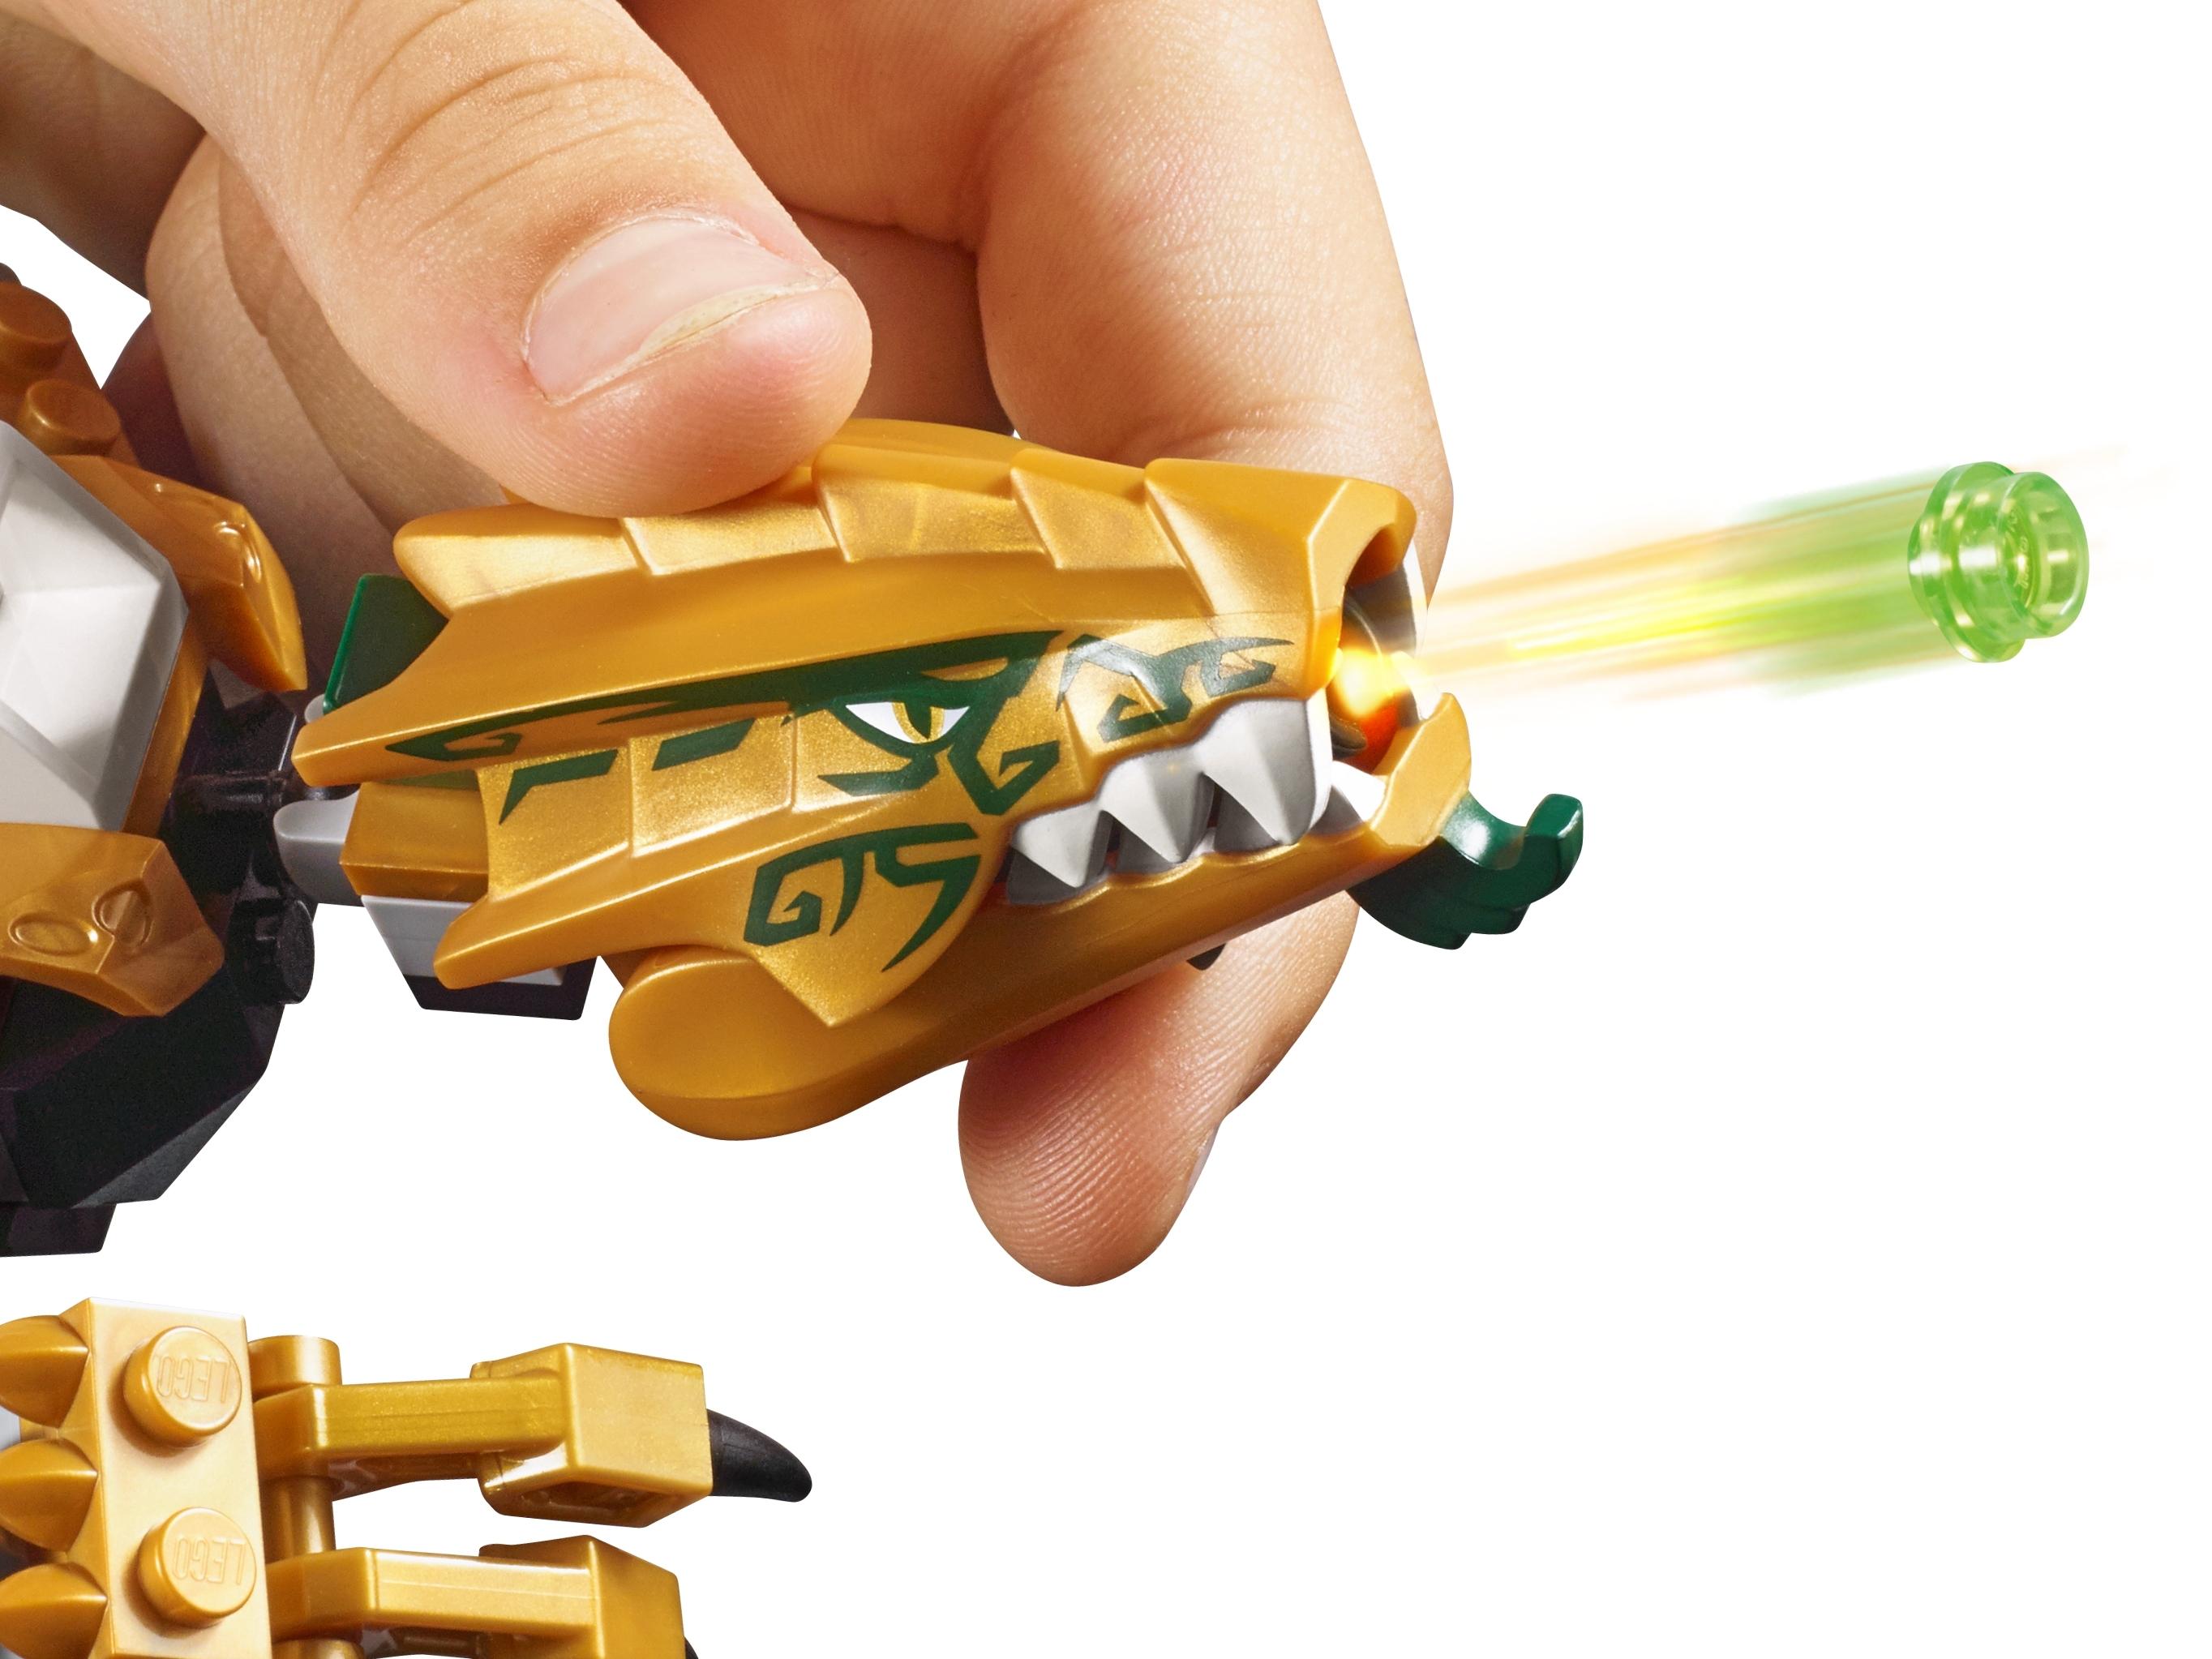 Ninjago toys golden dragon anesthesia code for epidural steroid injection